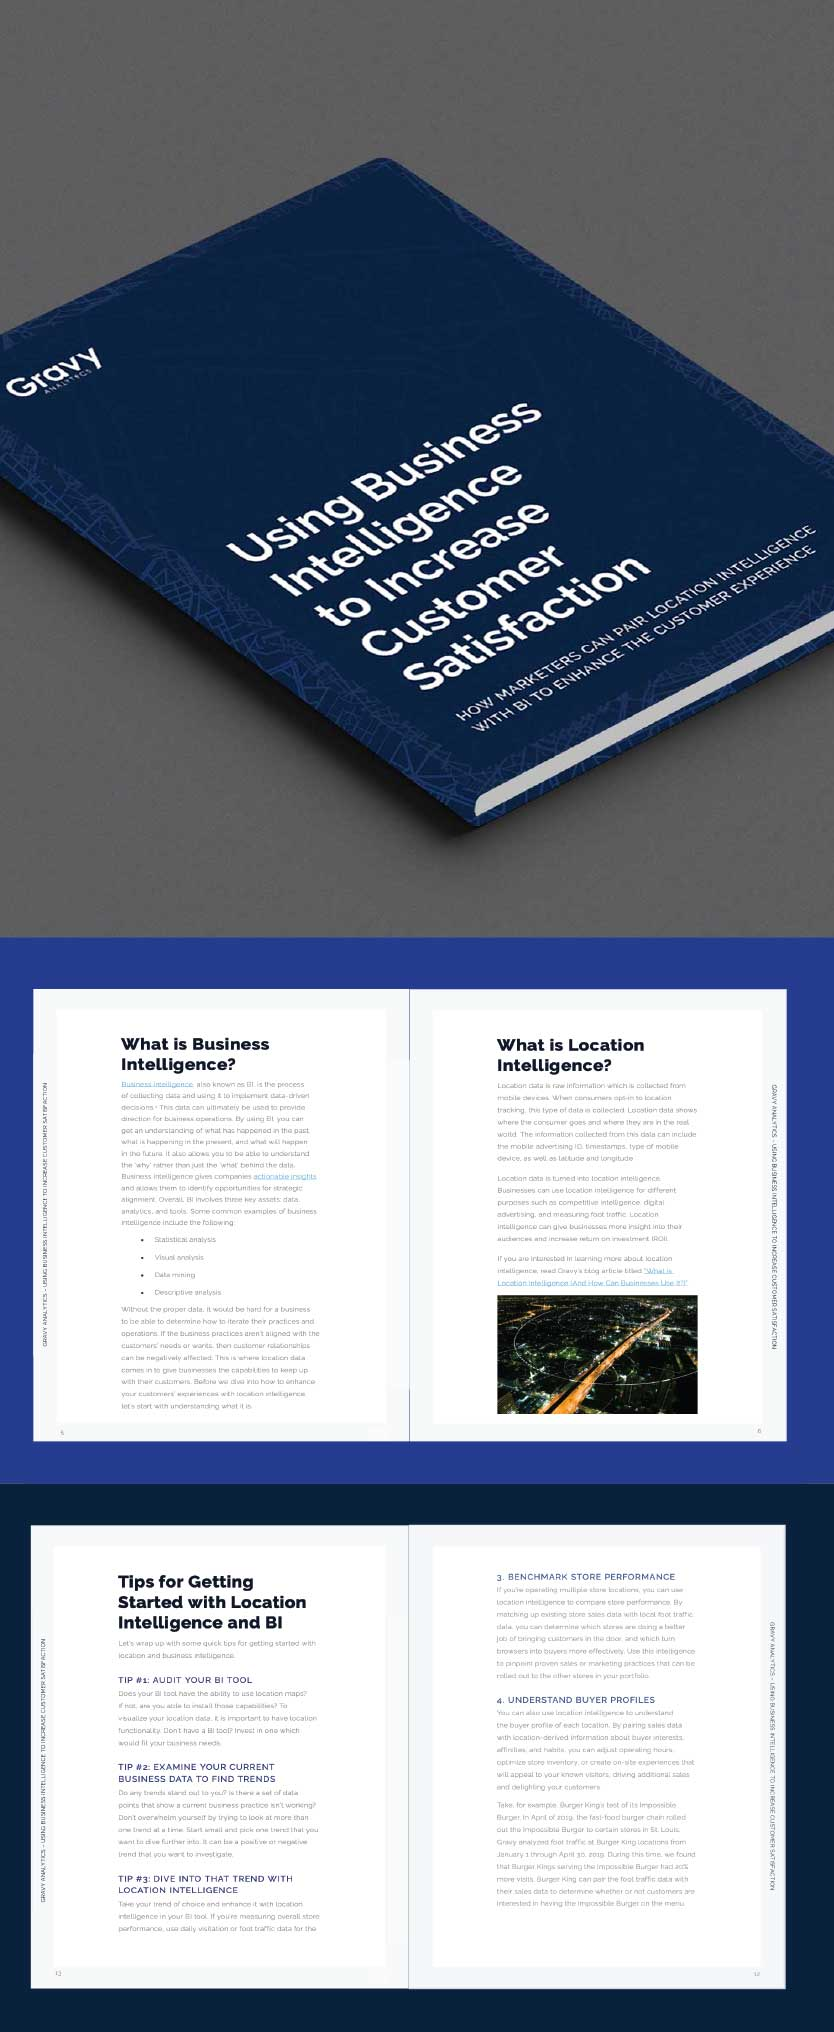 Using Business Intelligence (BI) to Increase Customer Satisfaction eBook